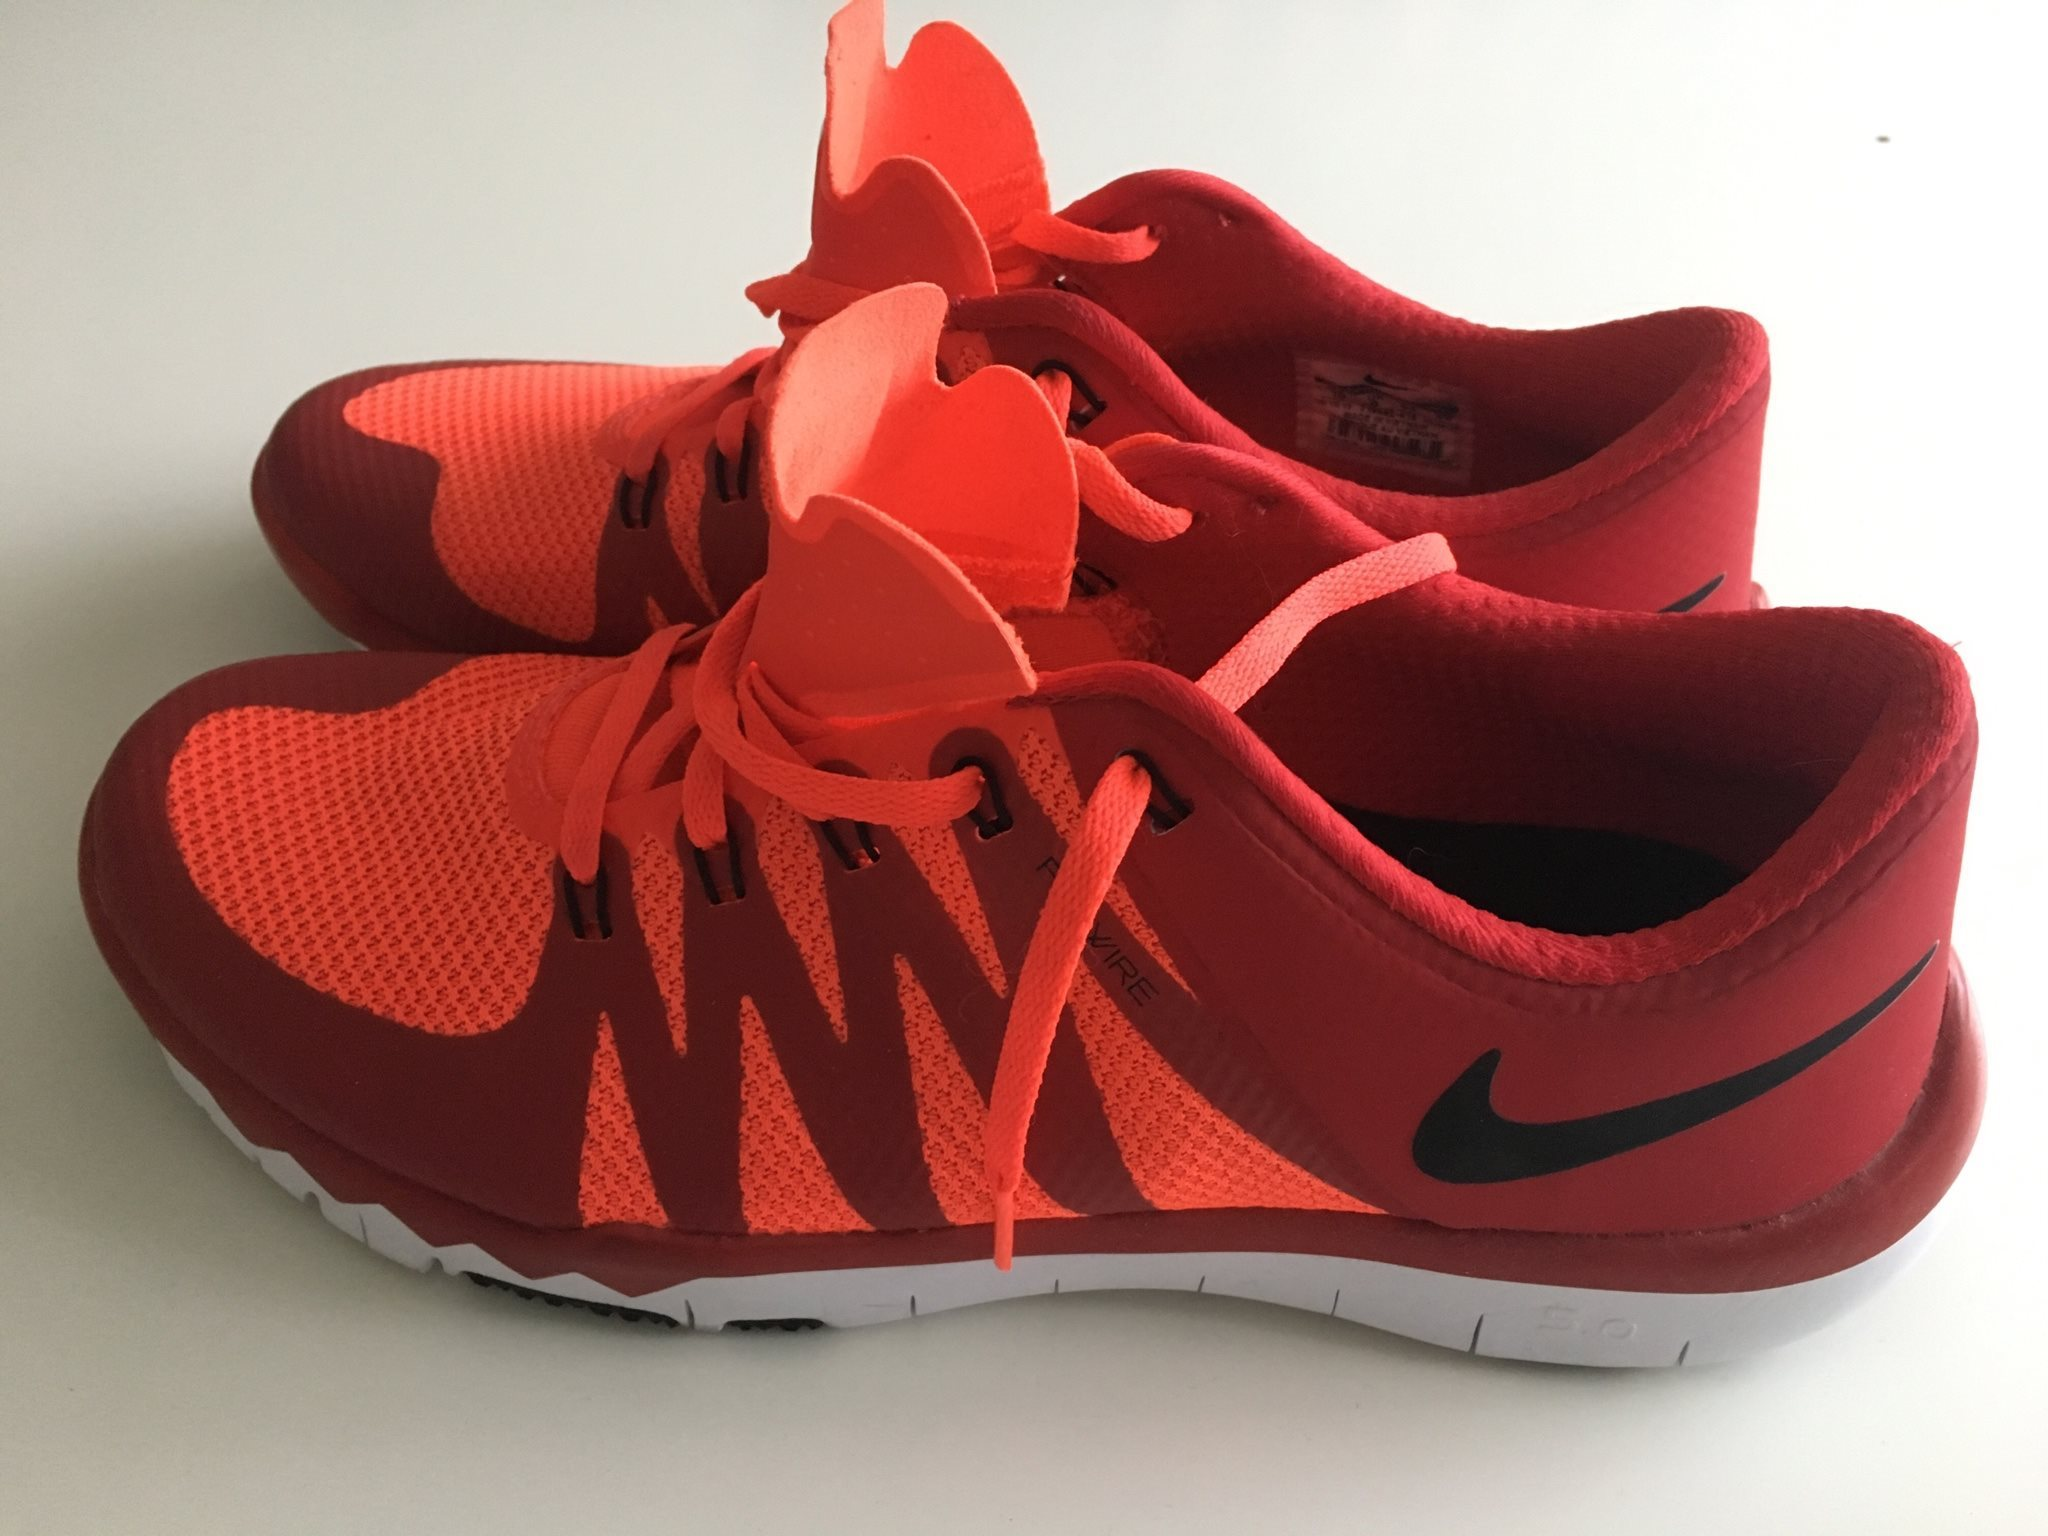 competitive price bd85d 79186 Nike Free 5.0 inomhus skor. Stl. 44